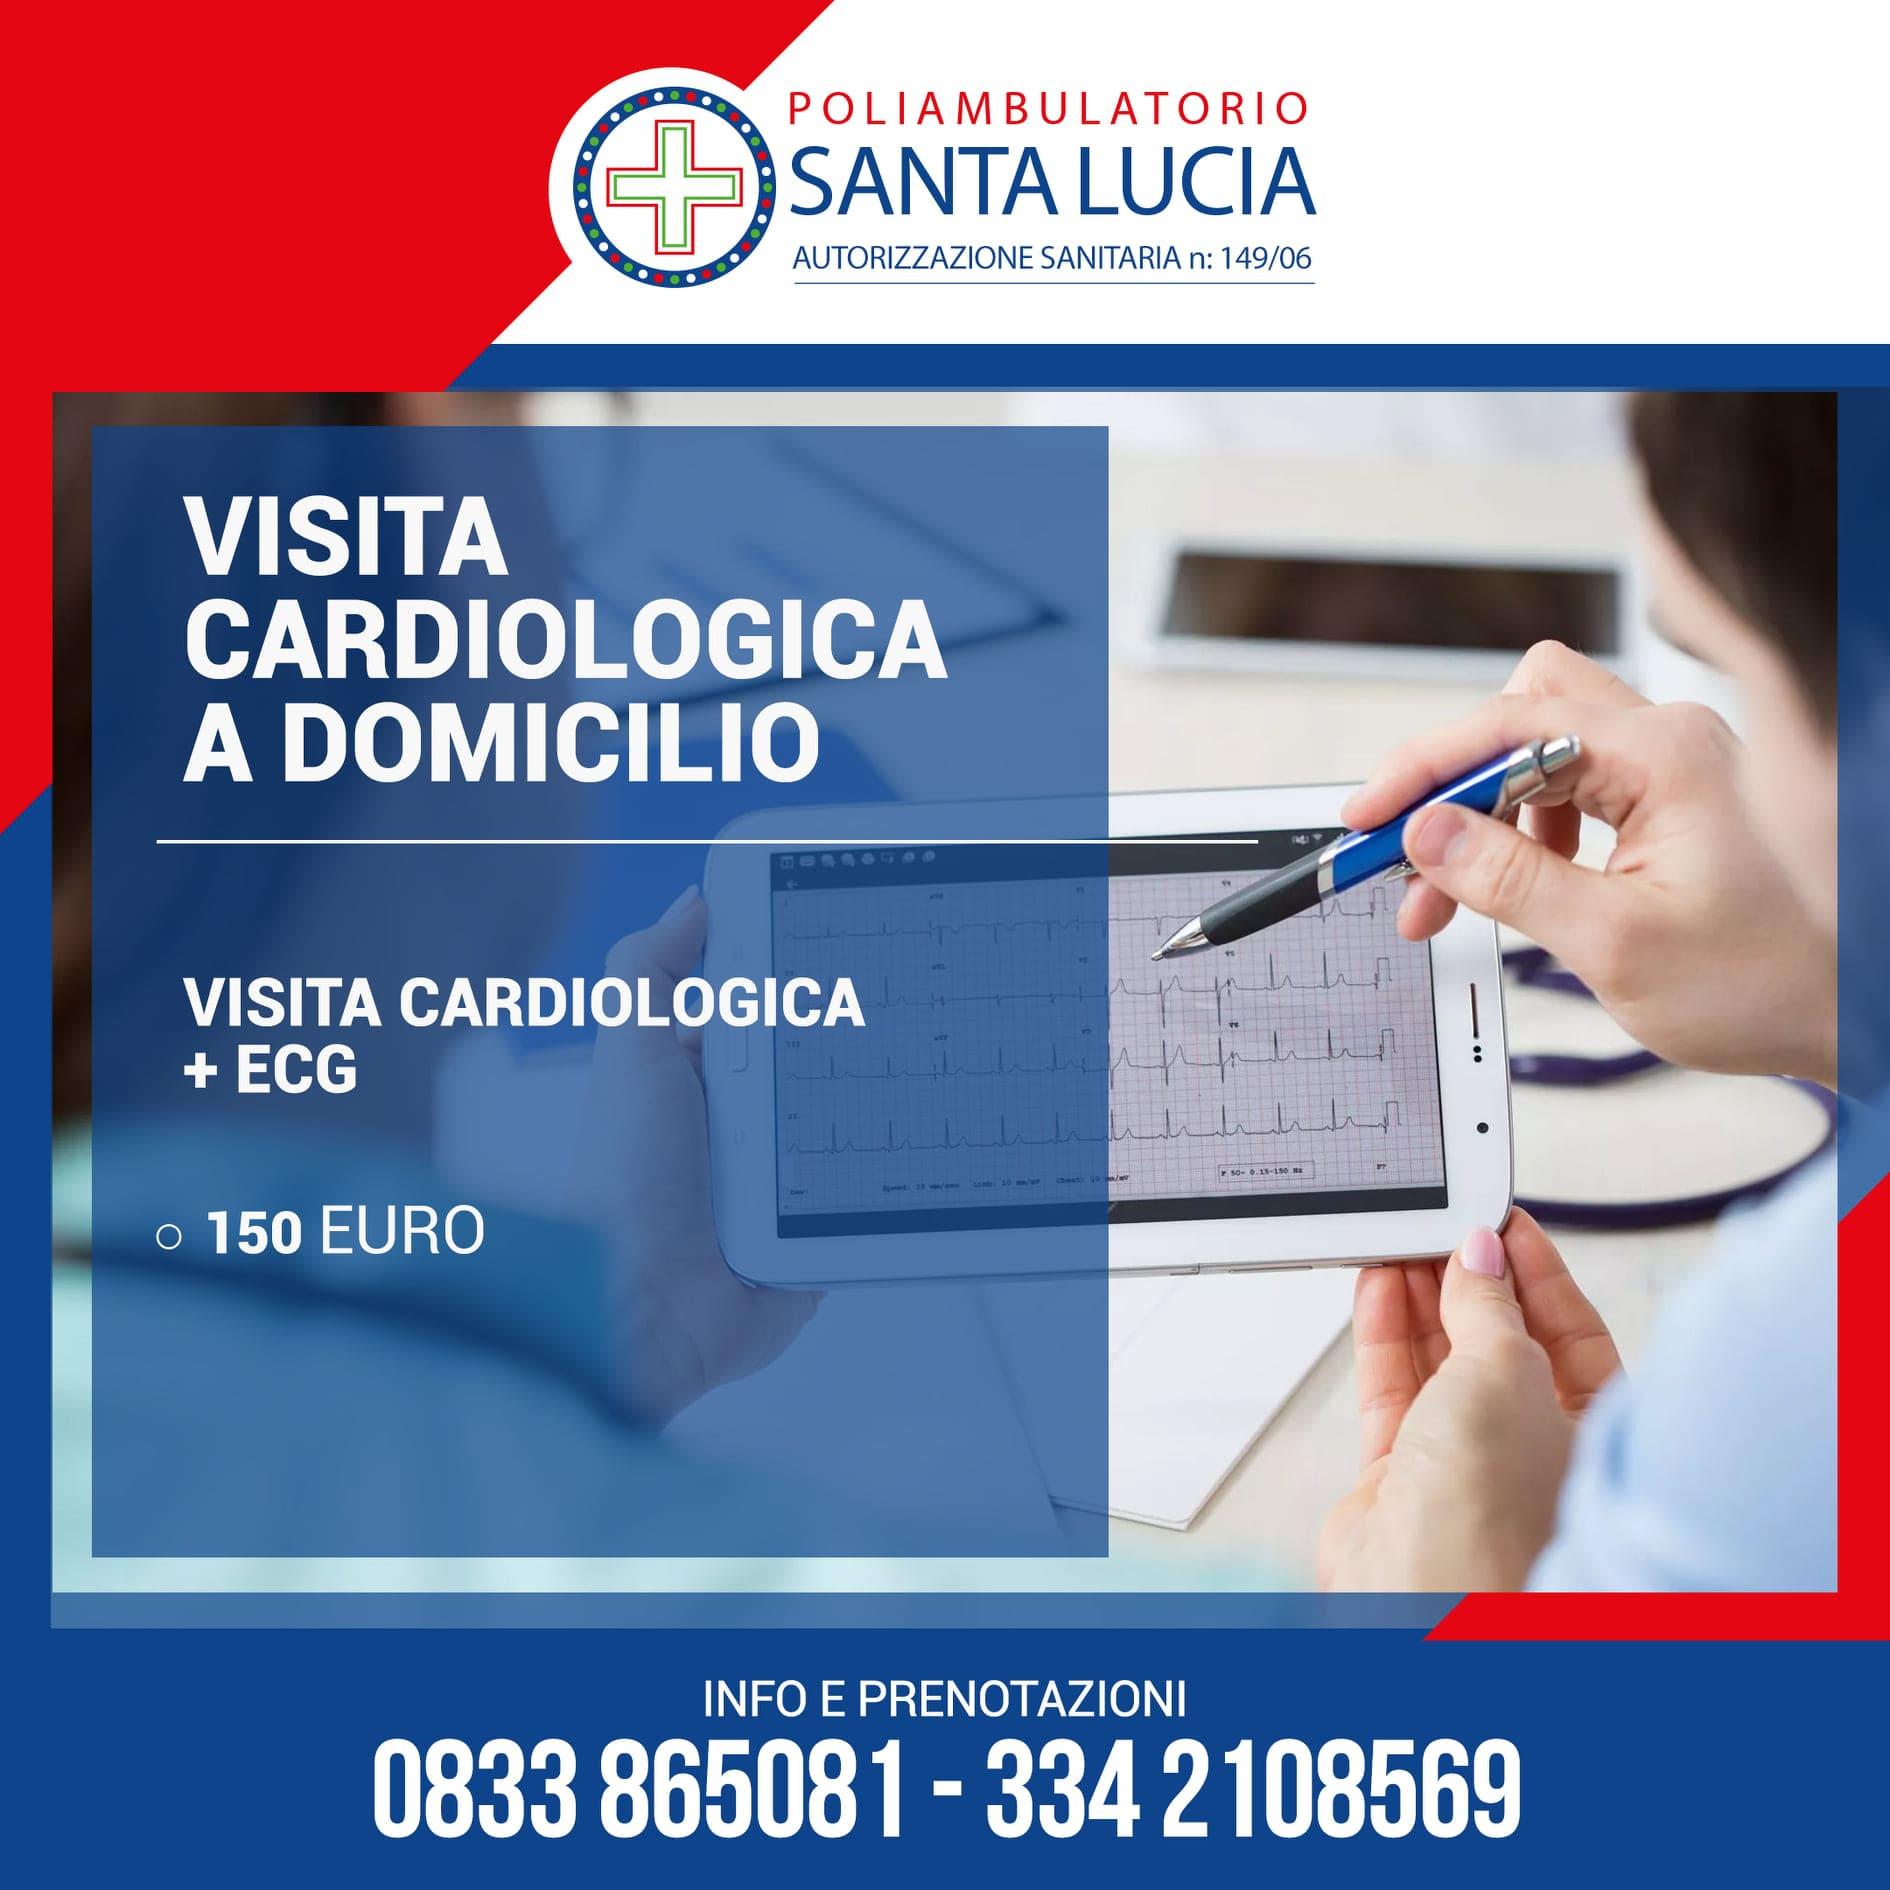 visita cardiologica ecg galatone poliambulatoio santa lucia